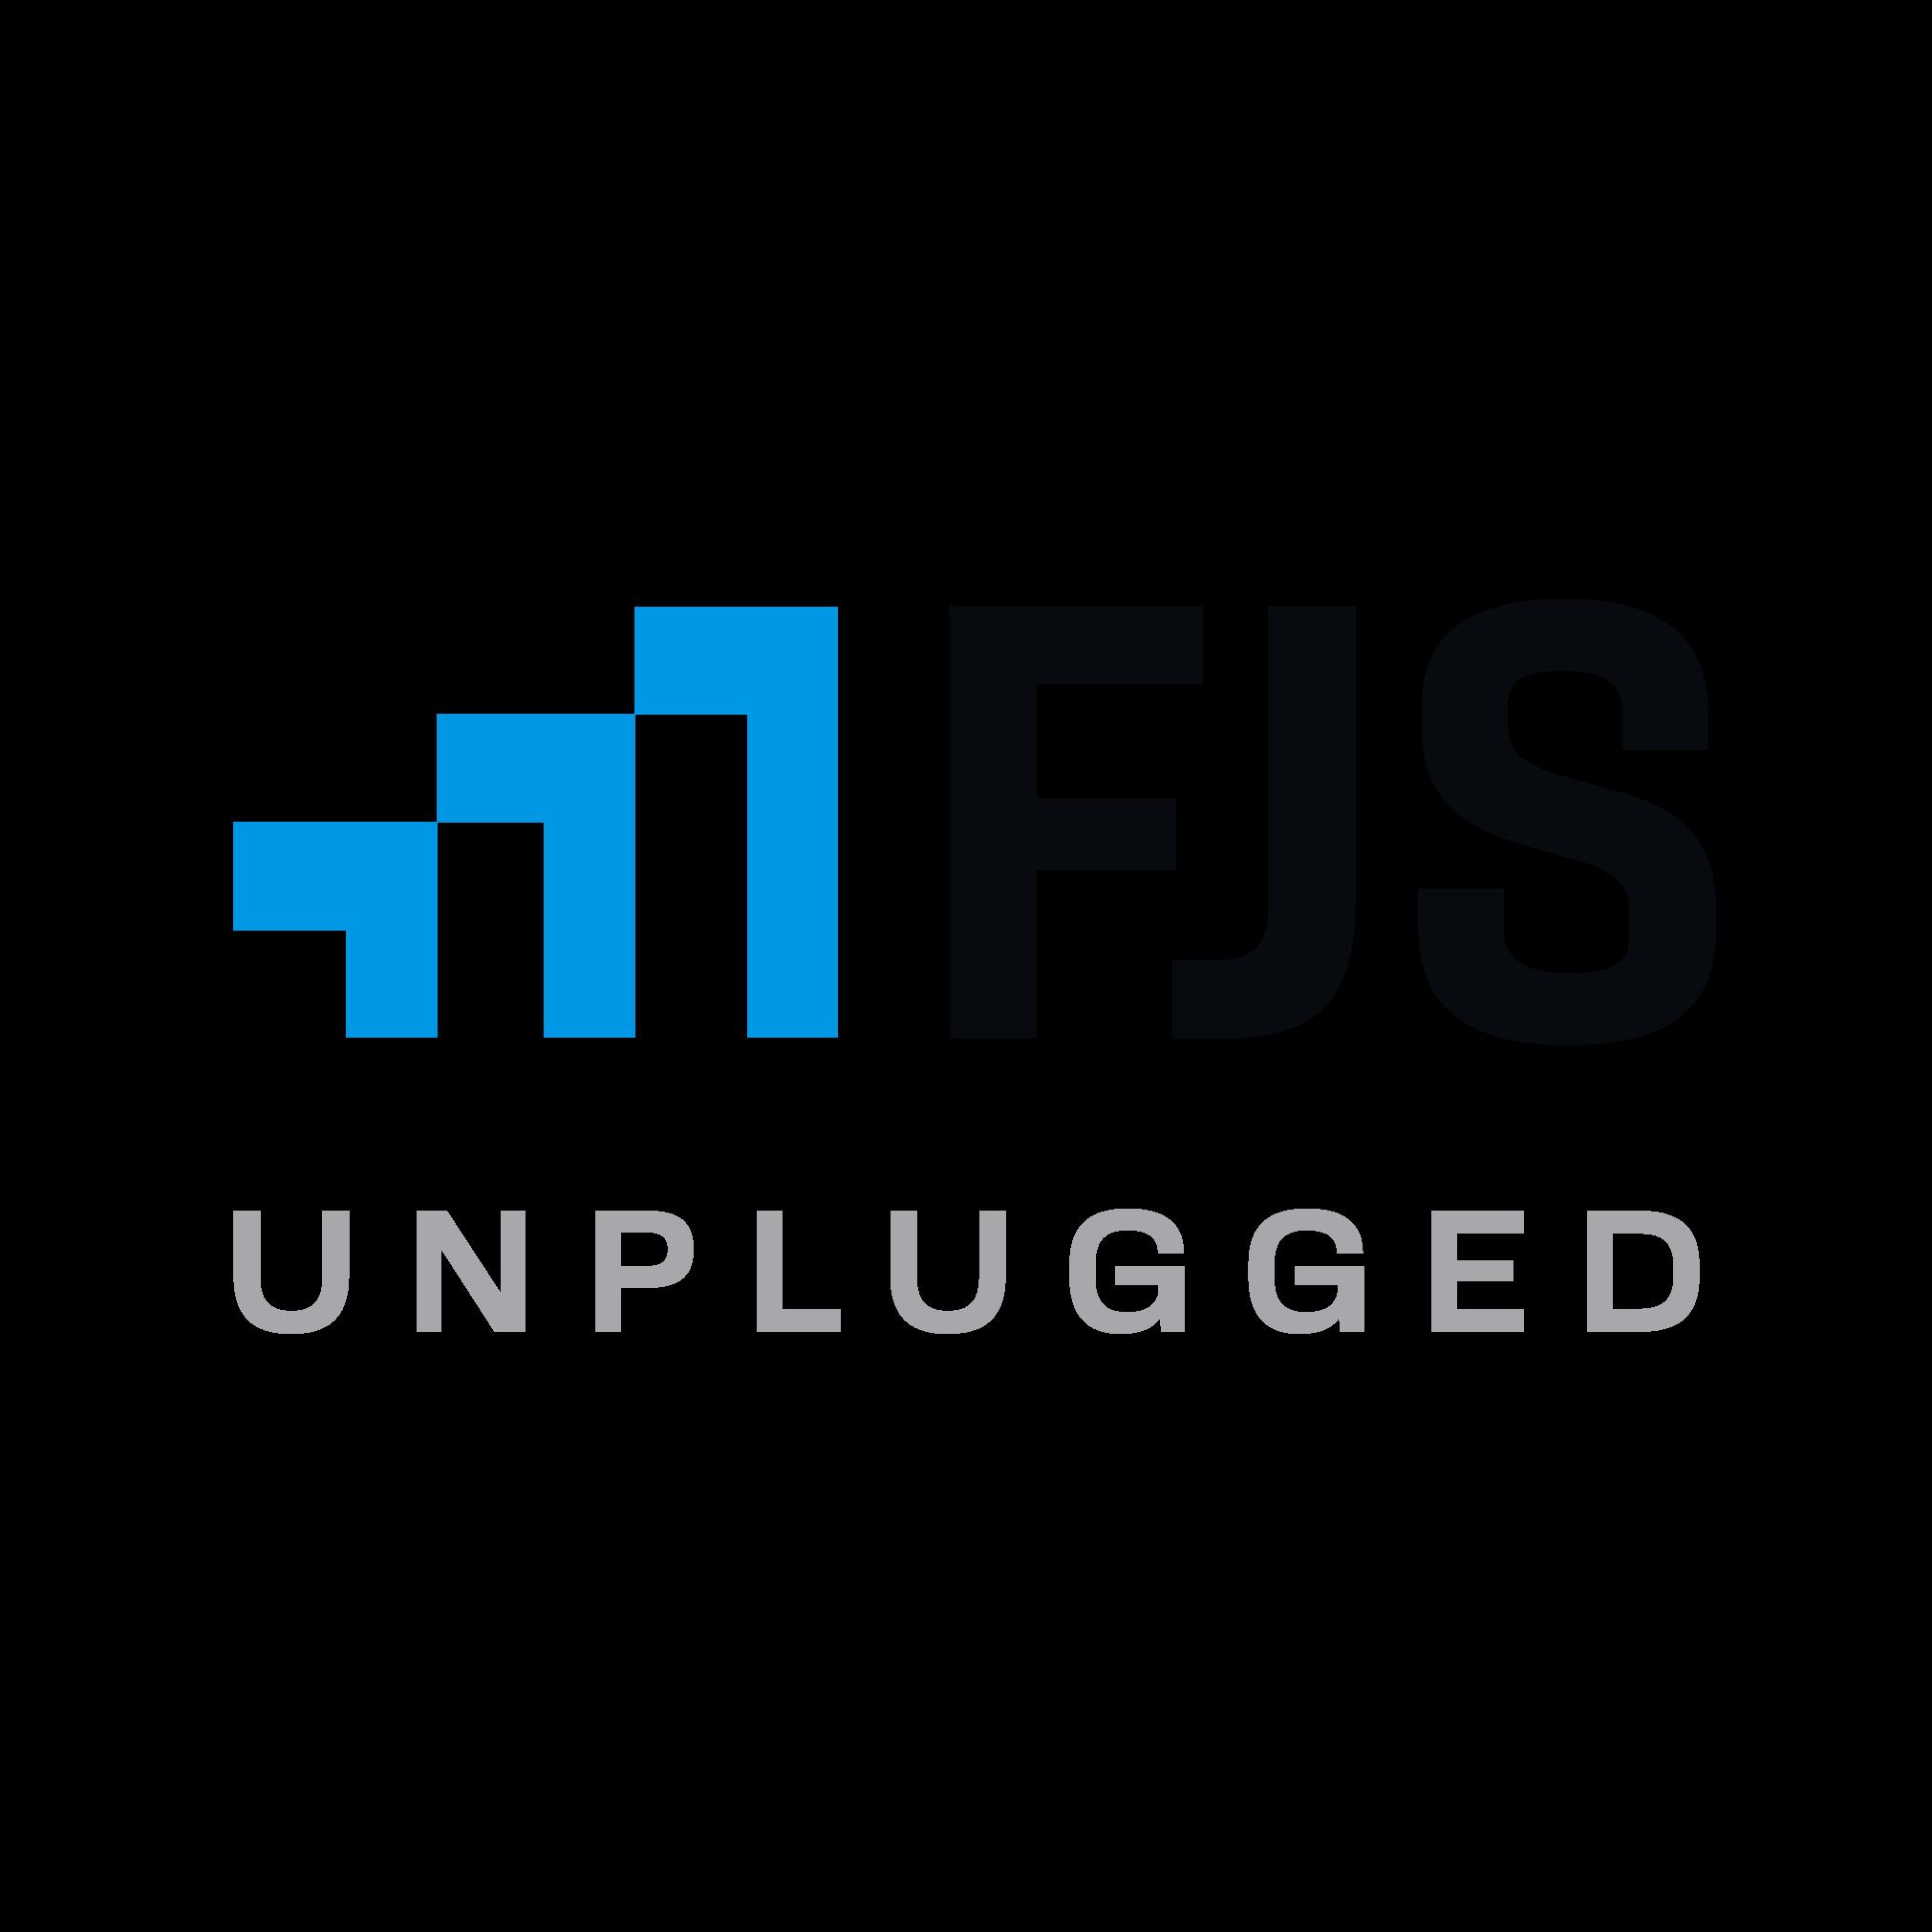 FJS Unplugged